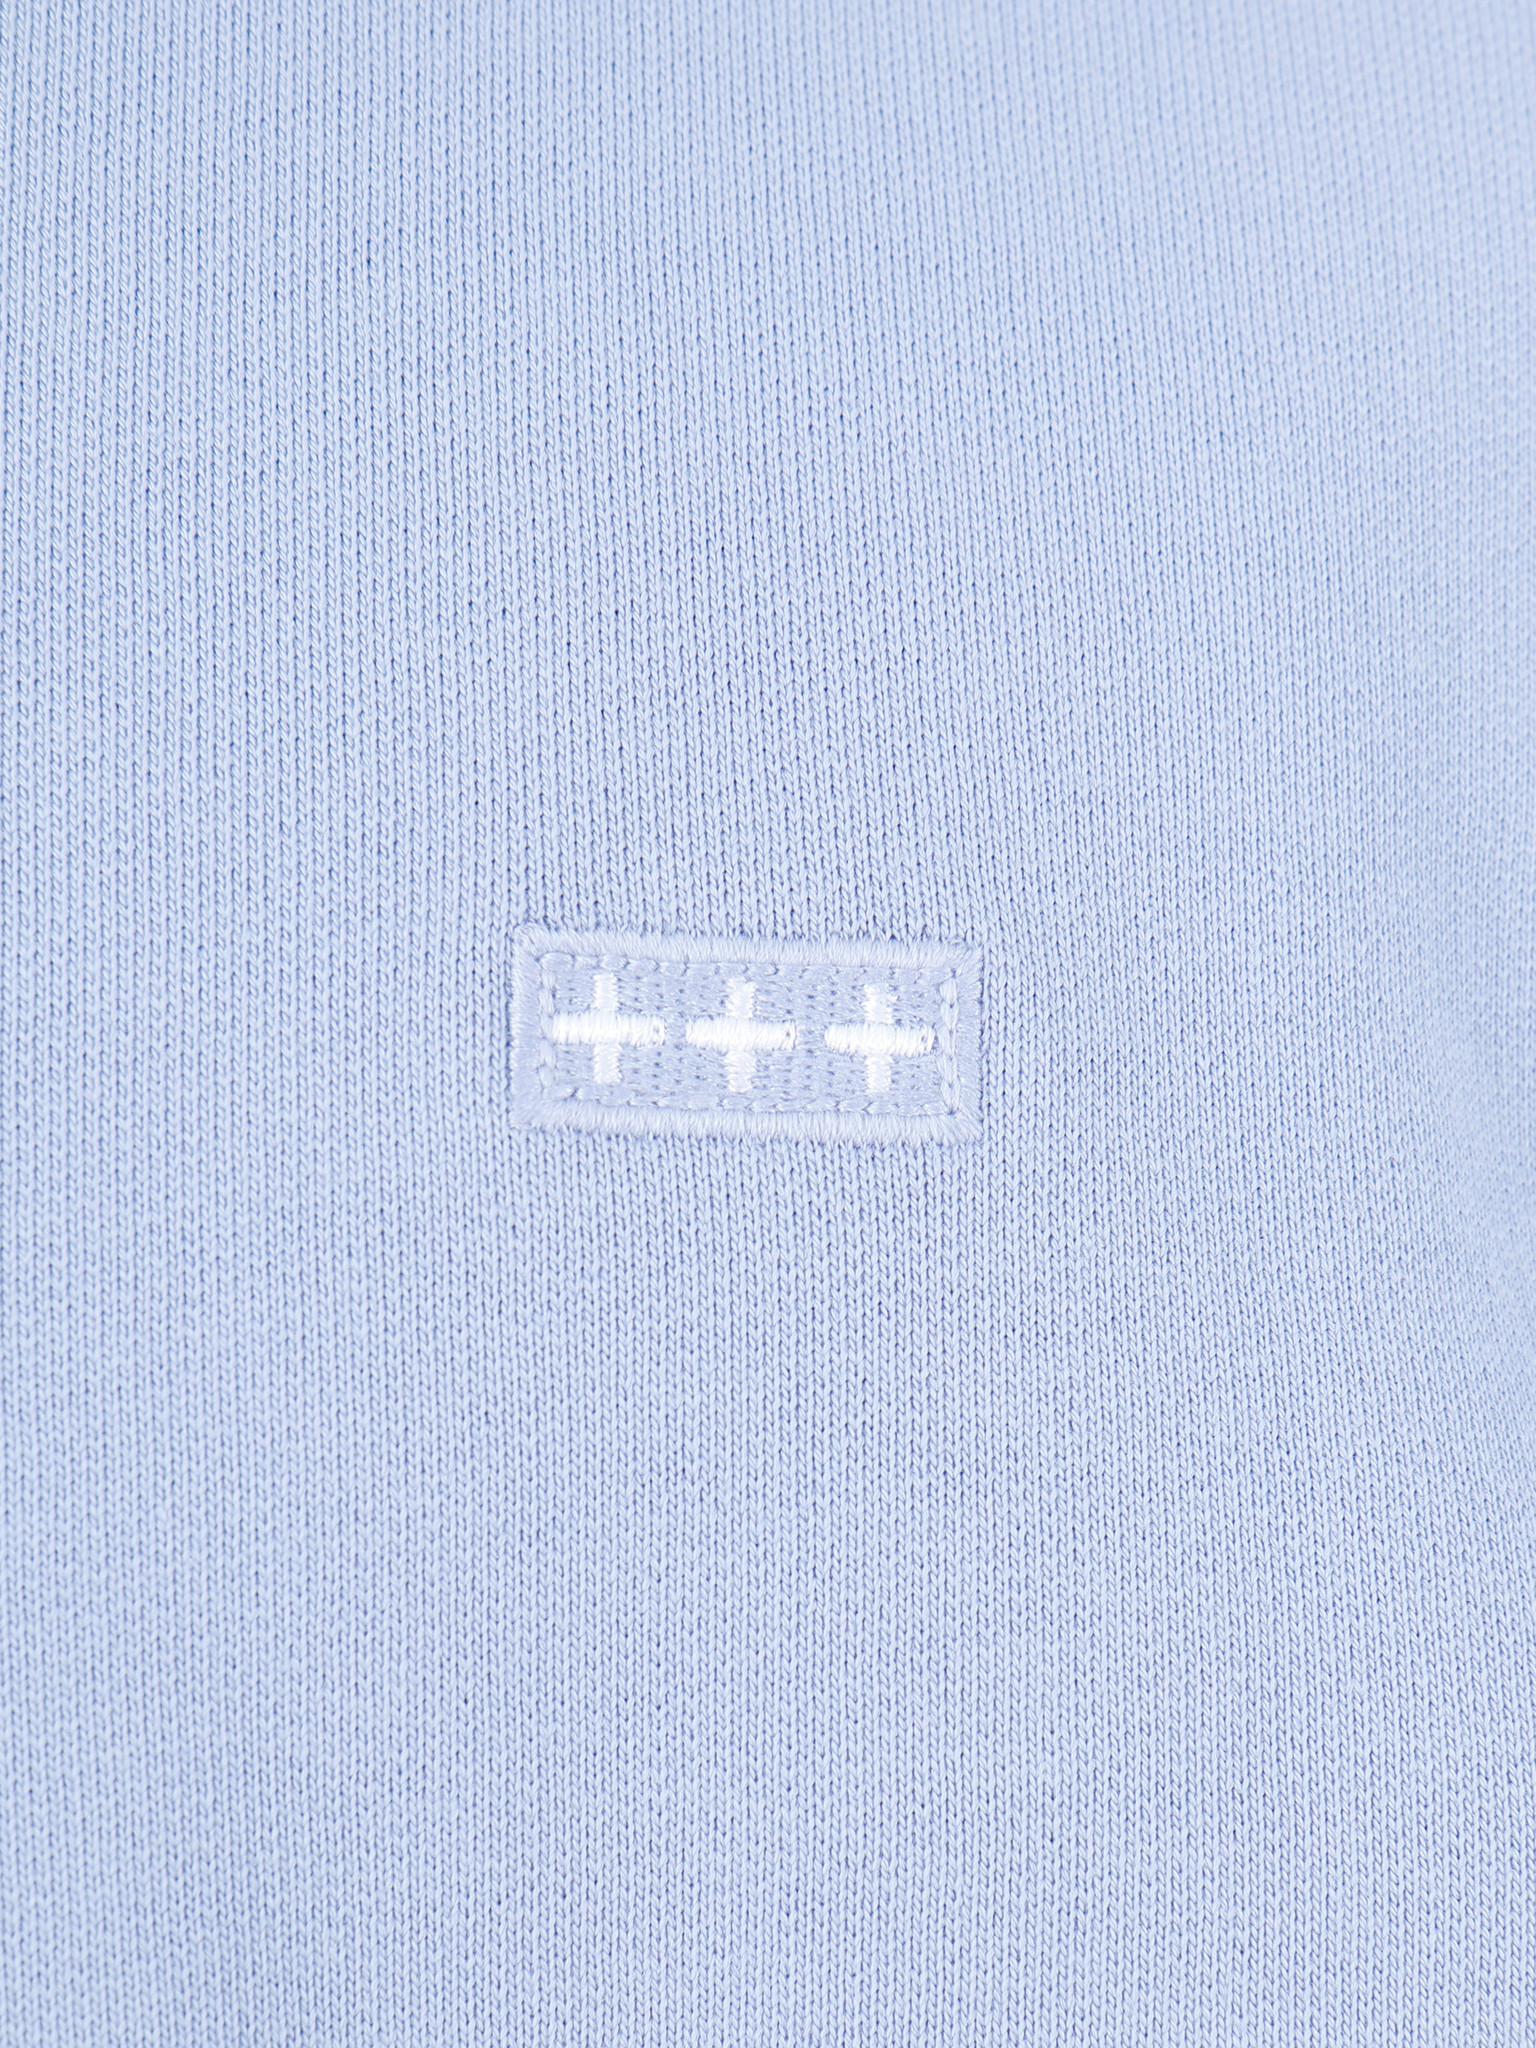 Quality Blanks Quality Blanks QB94 Patch Logo Crewneck Lilac